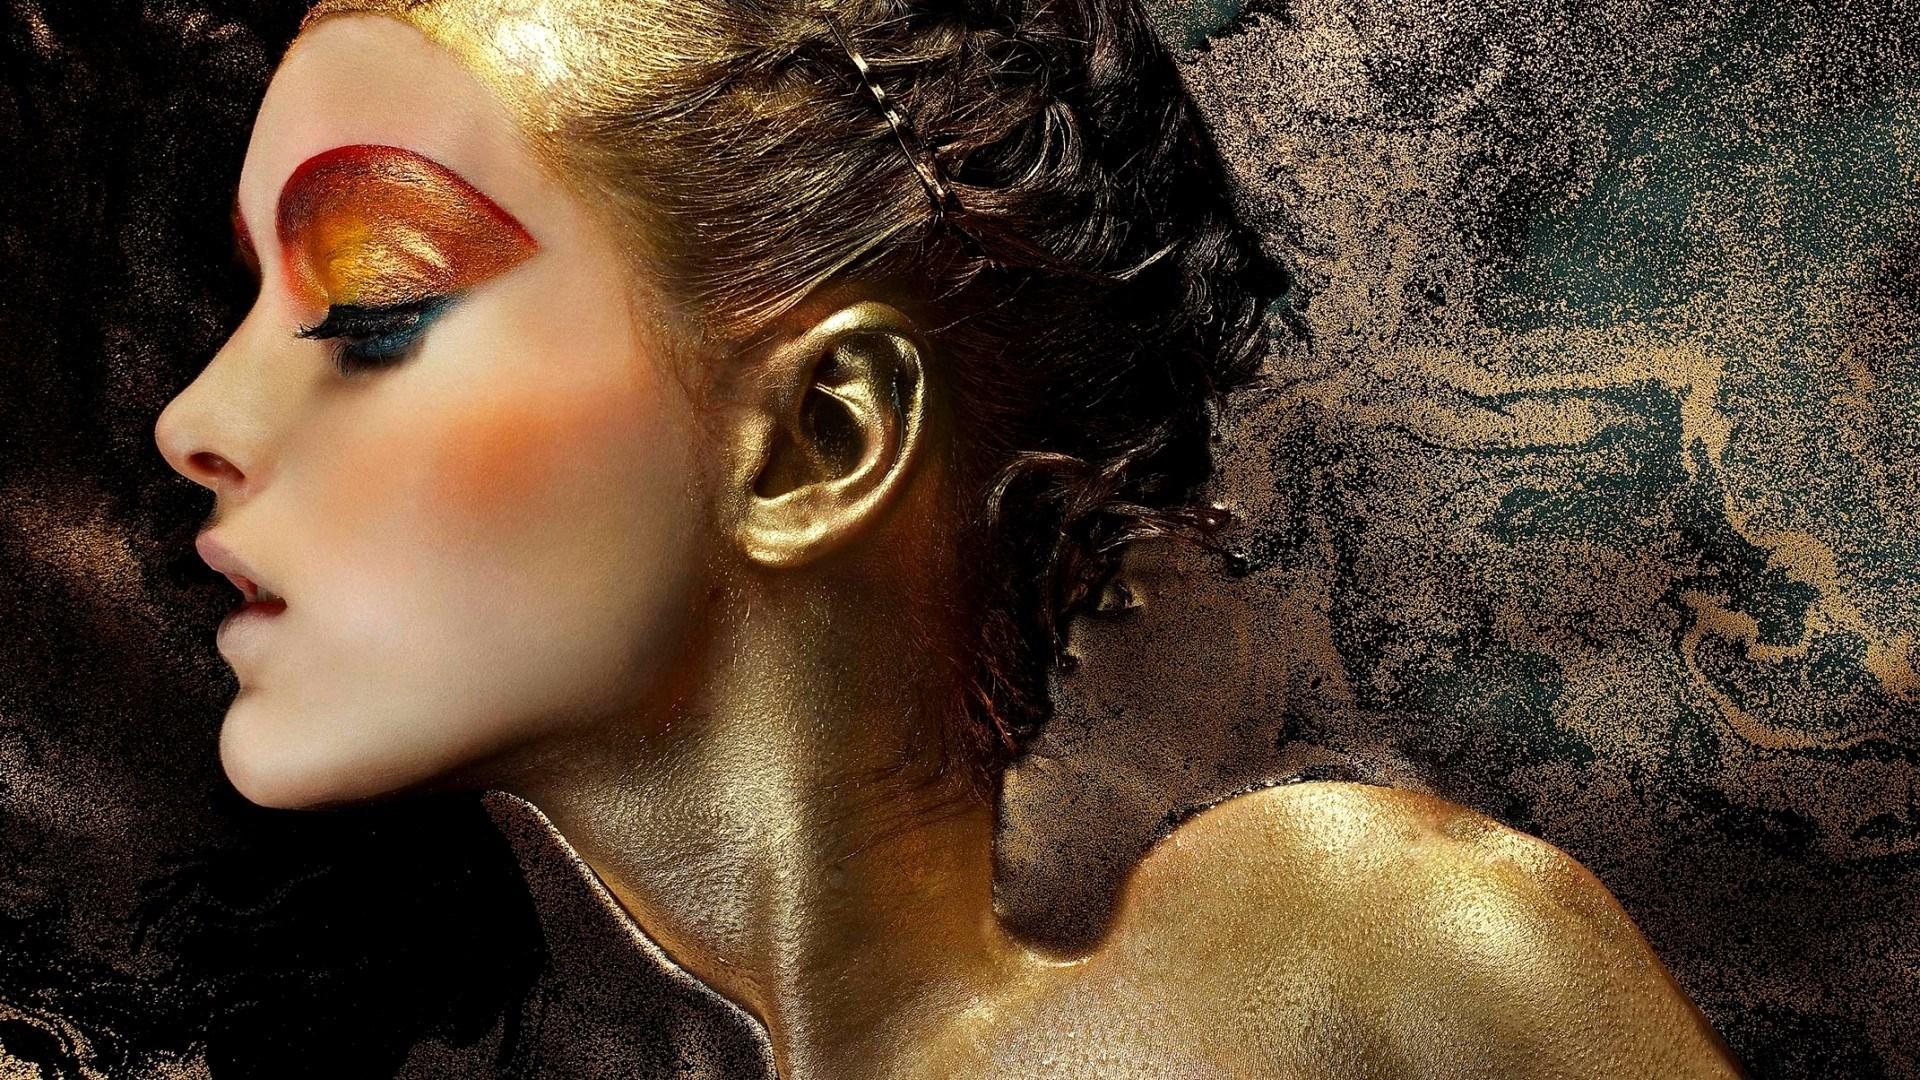 Related For Girl Face Eyeshadow Makeup. Makeup Girl